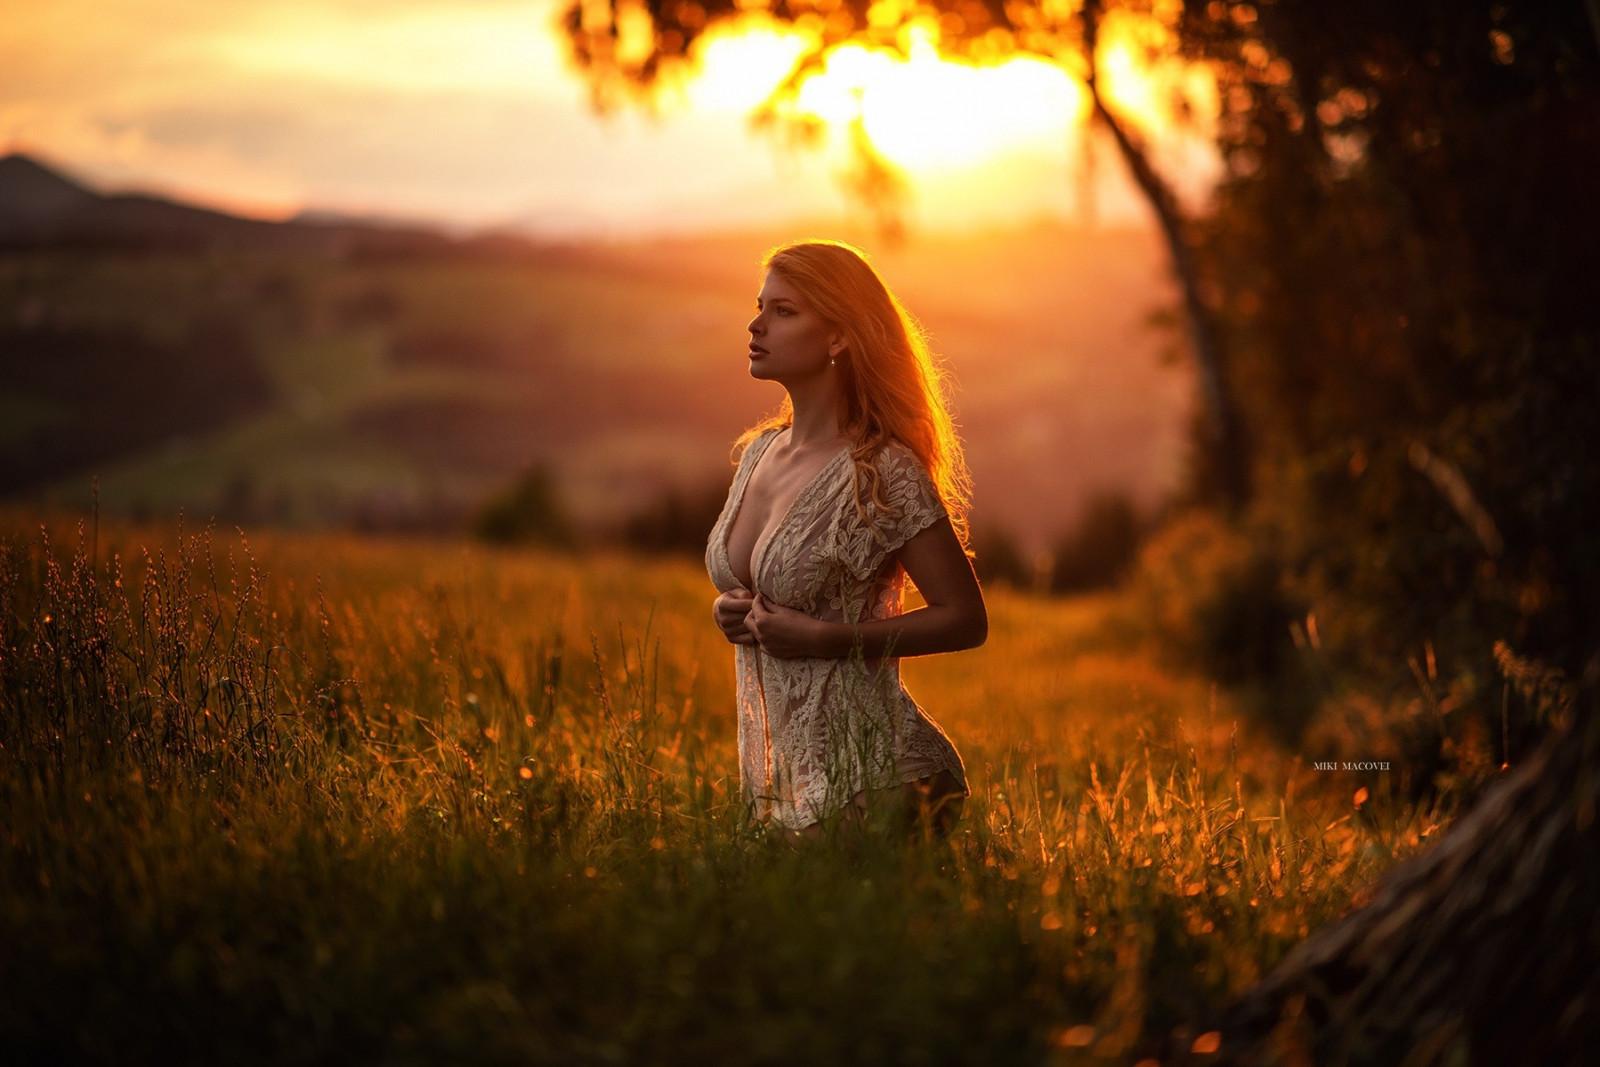 Wallpaper  Sunlight, Women Outdoors, Model, Blonde -5727